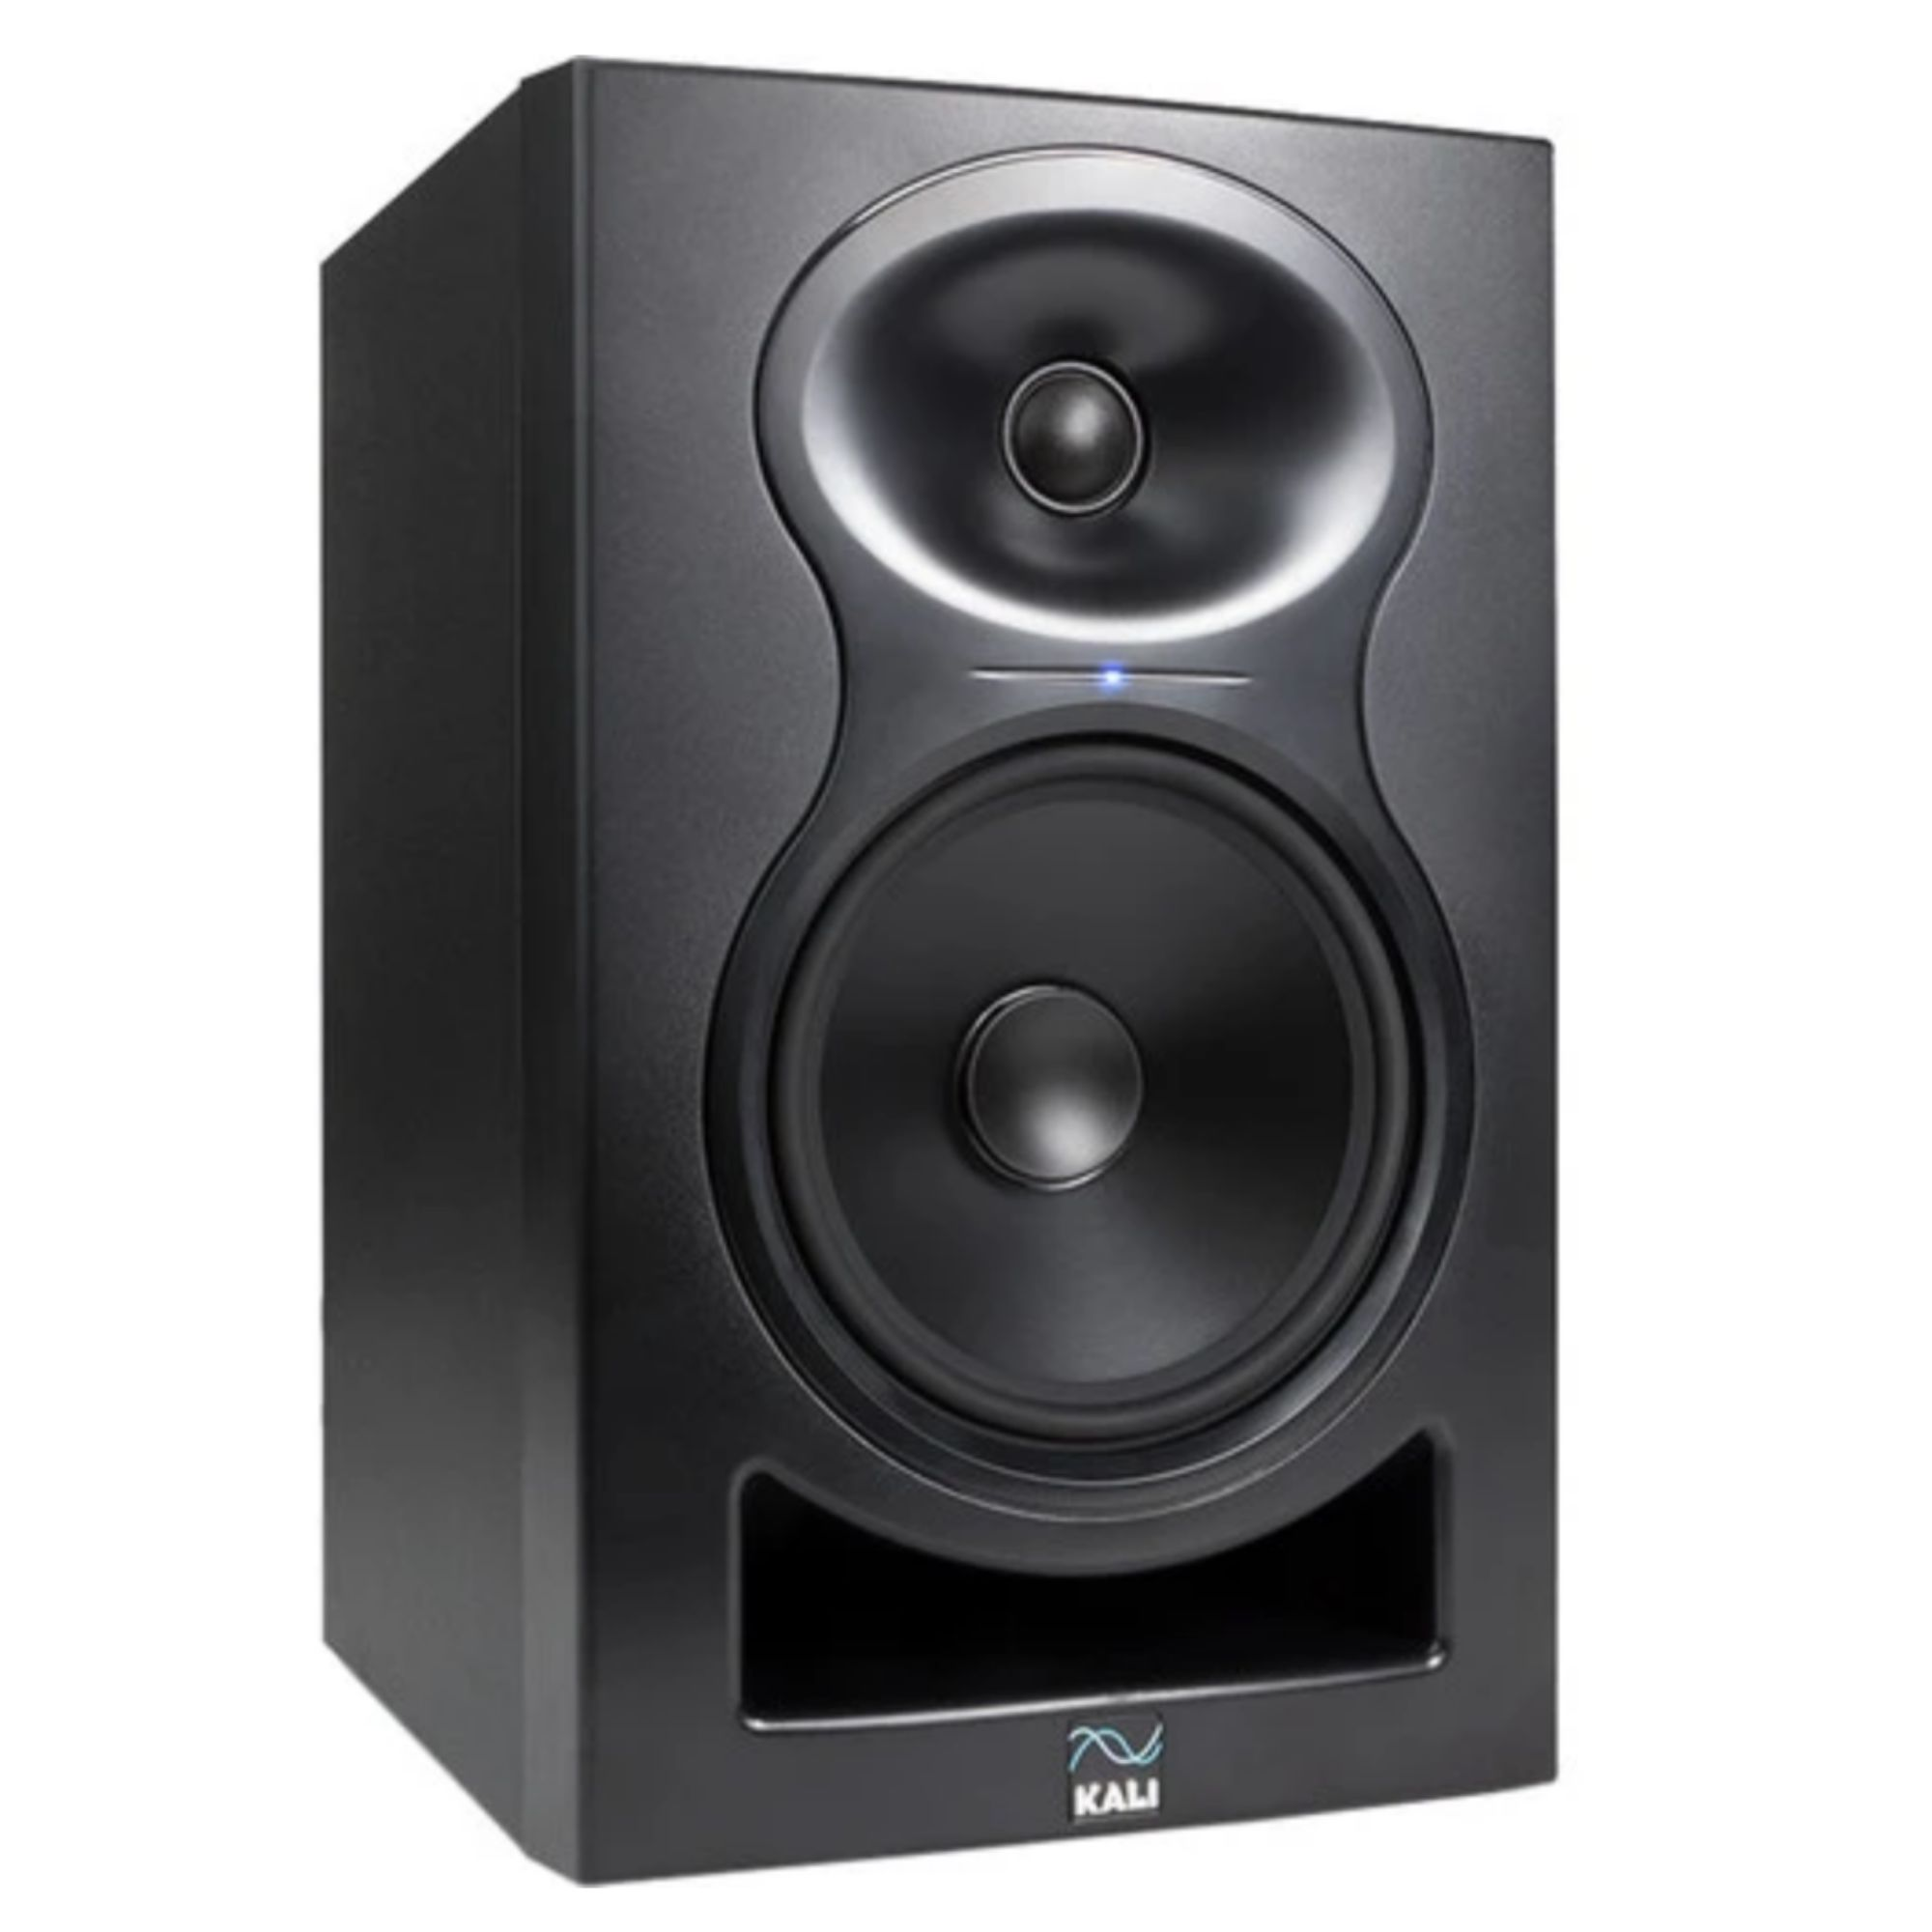 LP 6 ( Lone pine Series ) - by Kali Audio